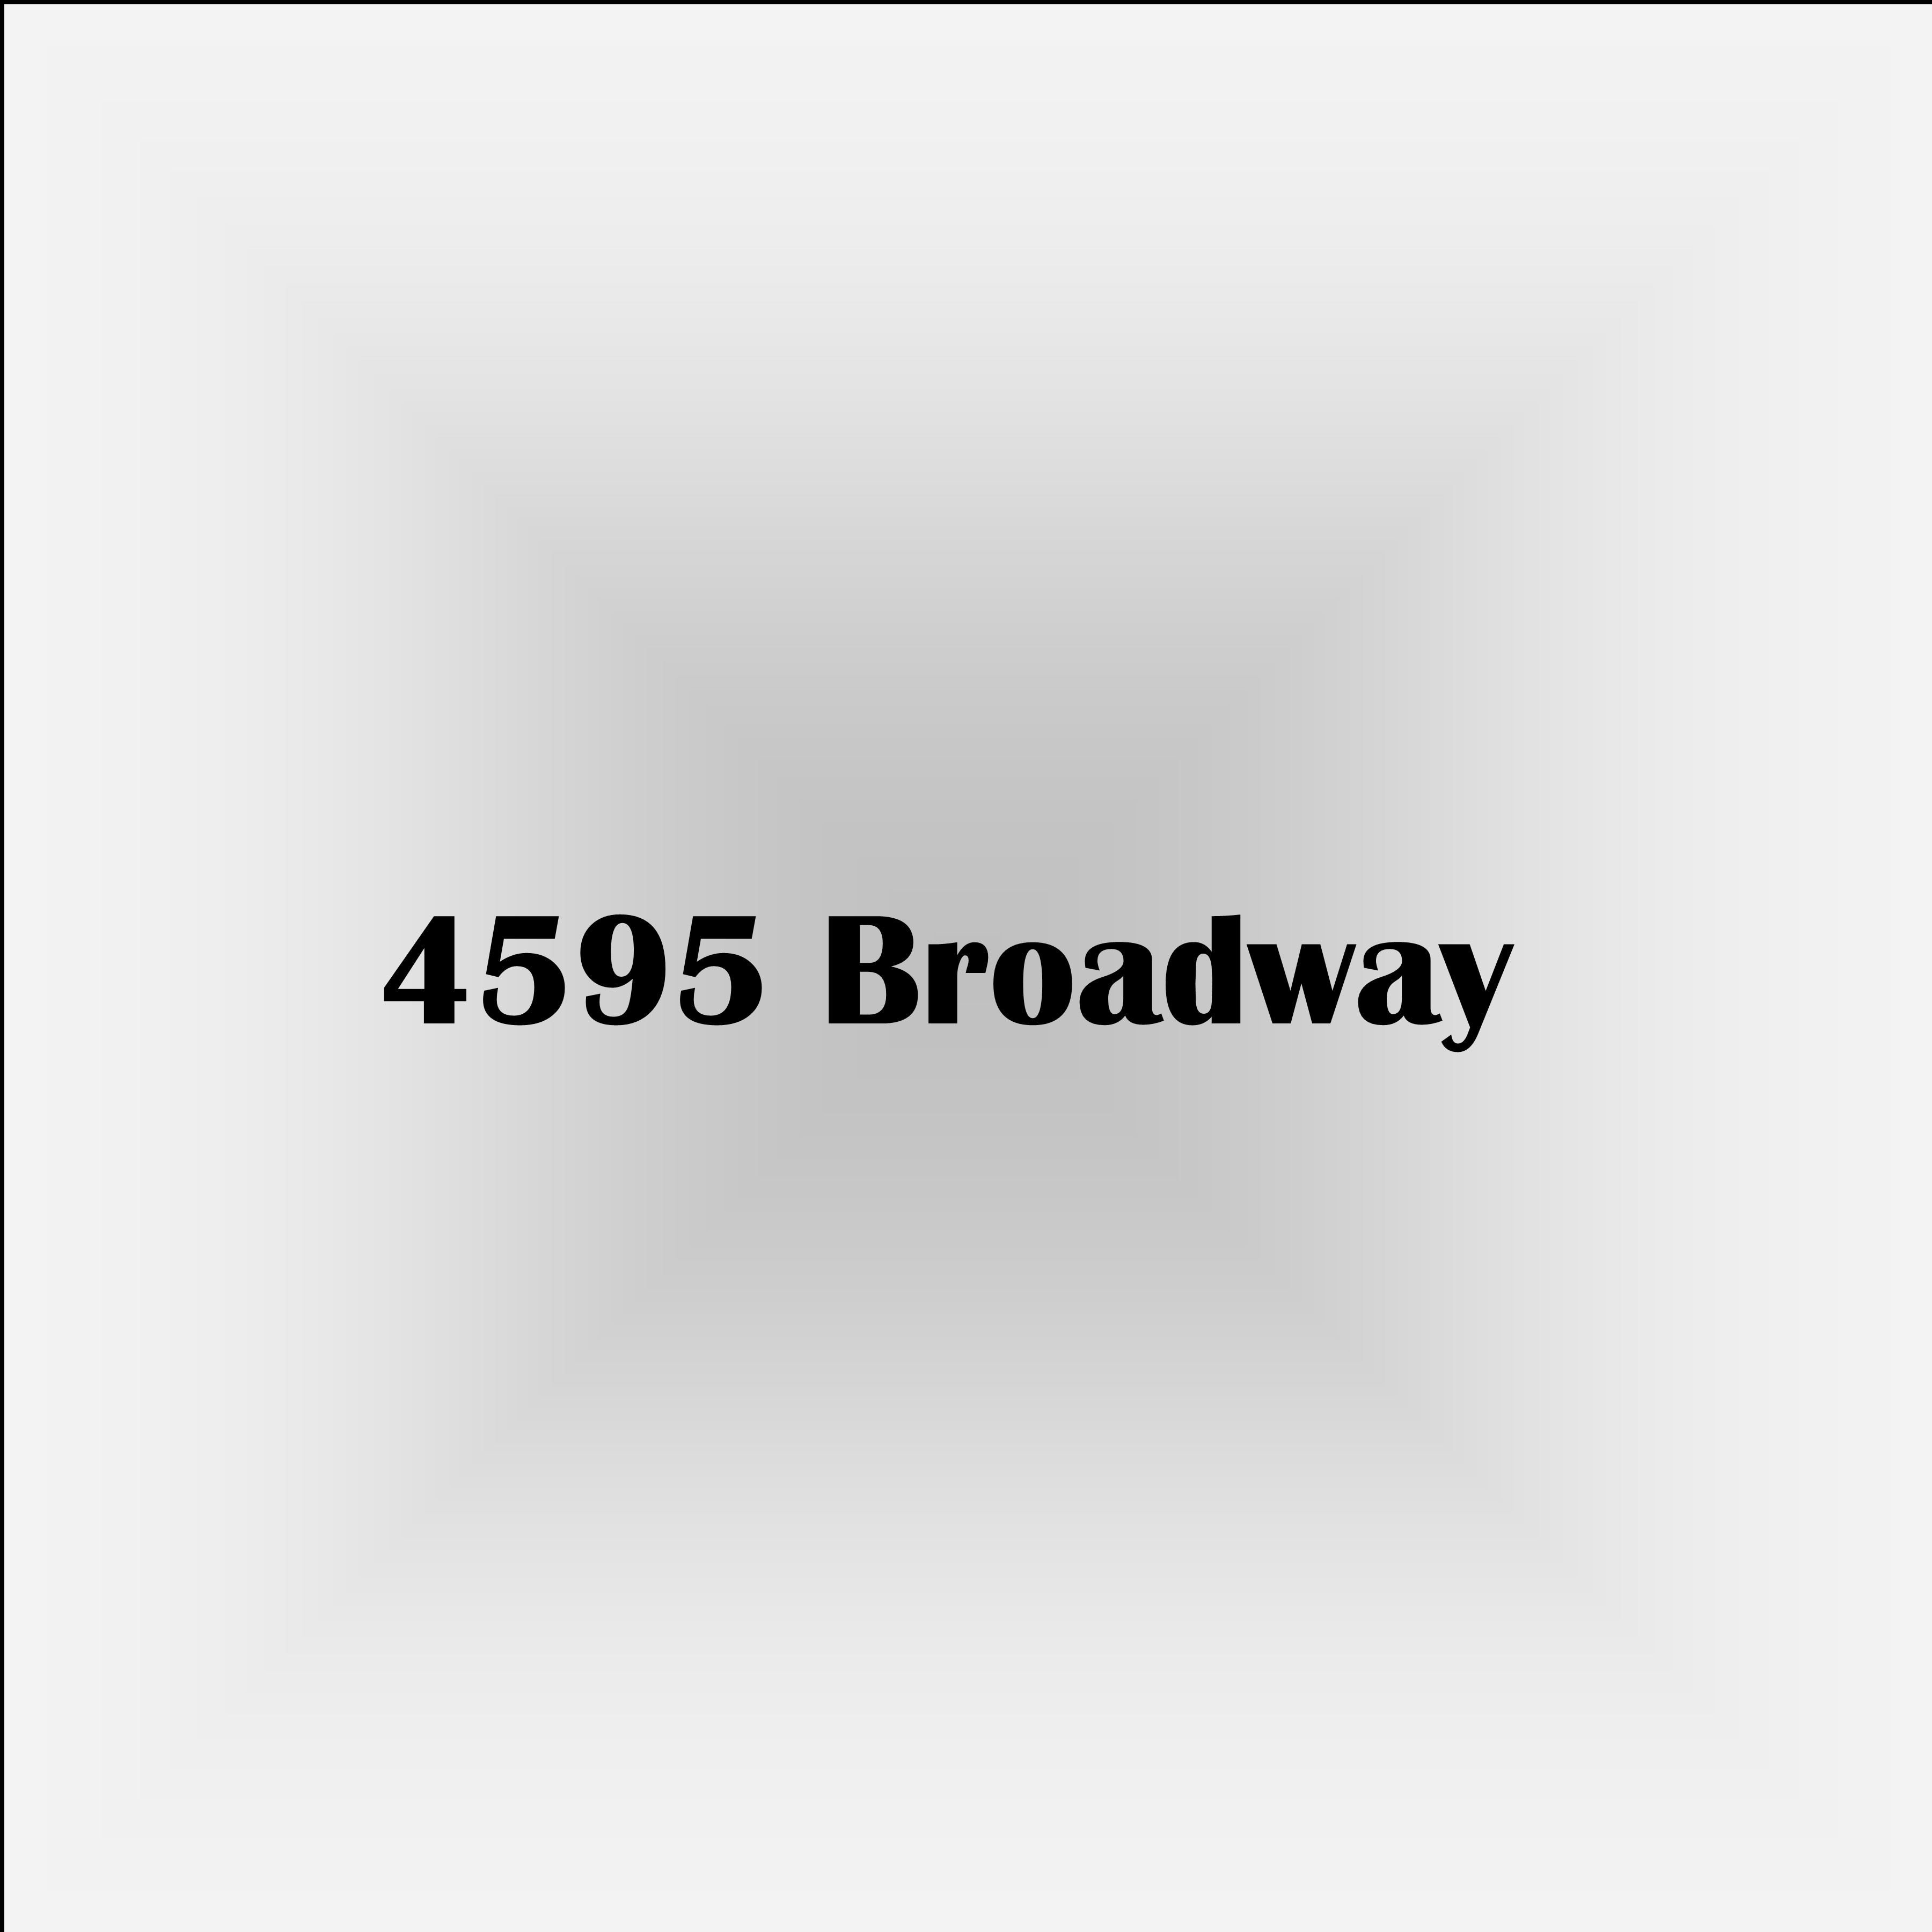 (219) 884-1341